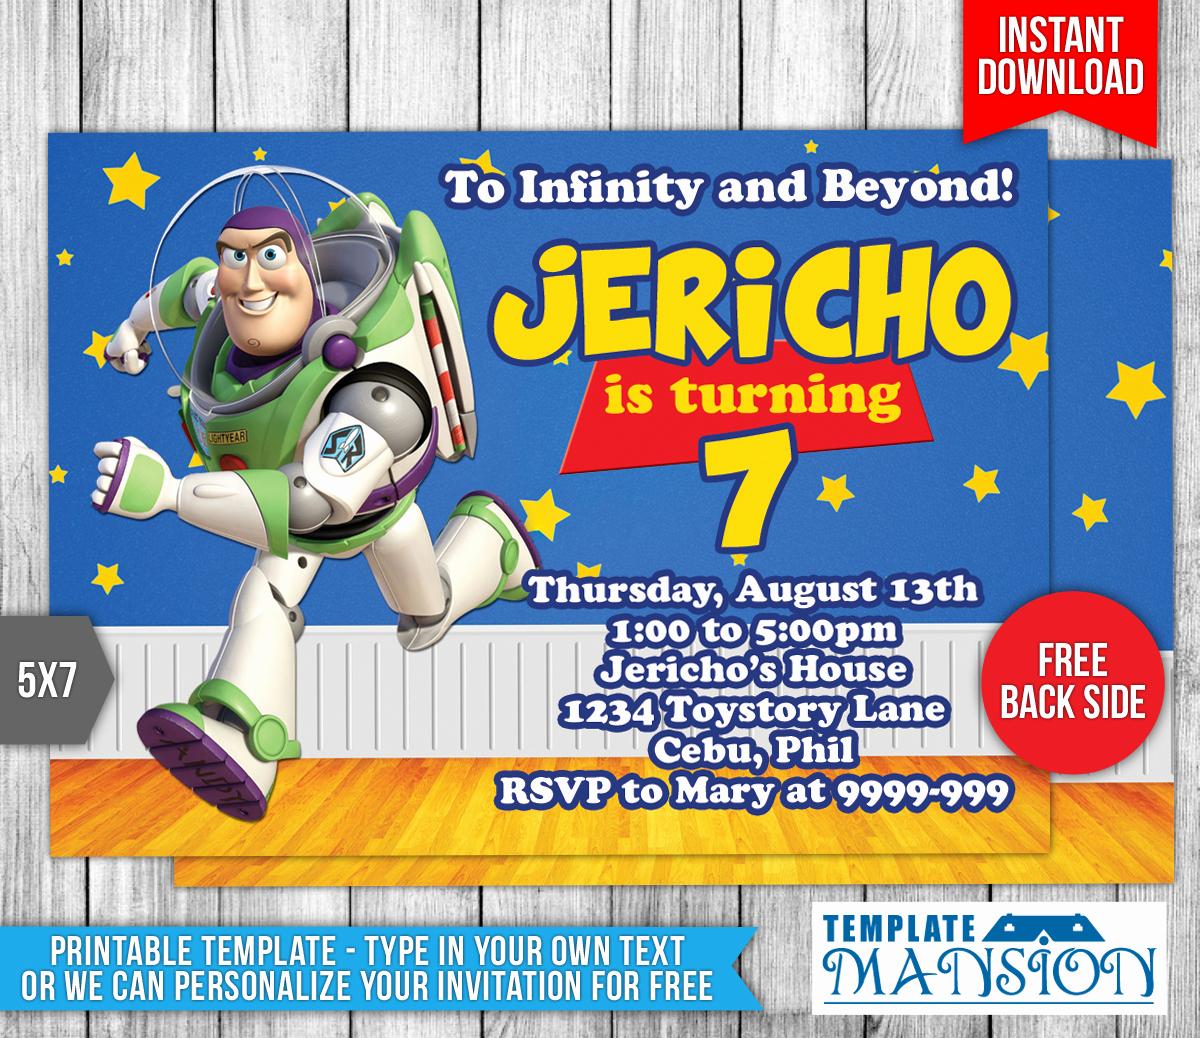 Toy Story Invitation Templates Free Luxury Buzz Lightyear toy Story Birthday Invitation by